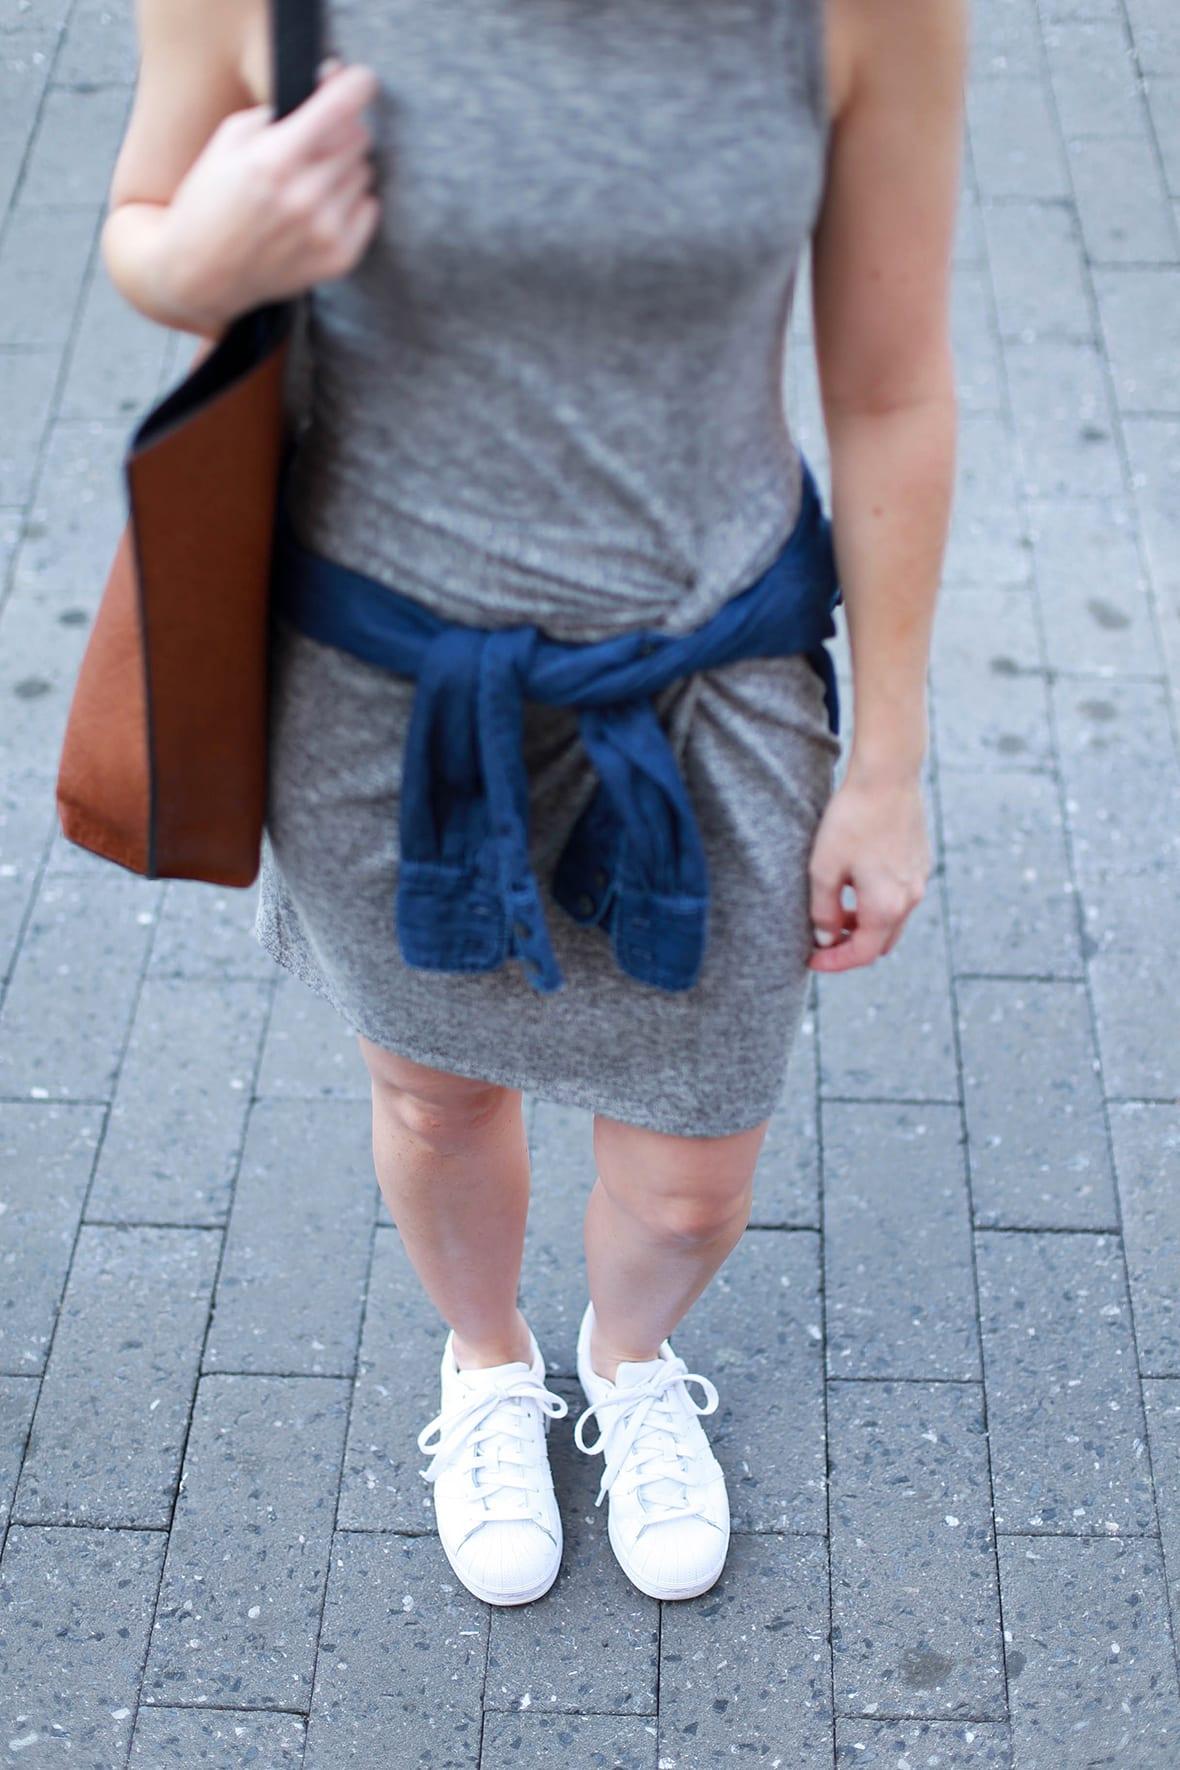 Poor Little It Girl - Abercrombie Knot Front Dress - @poorlilitgirl